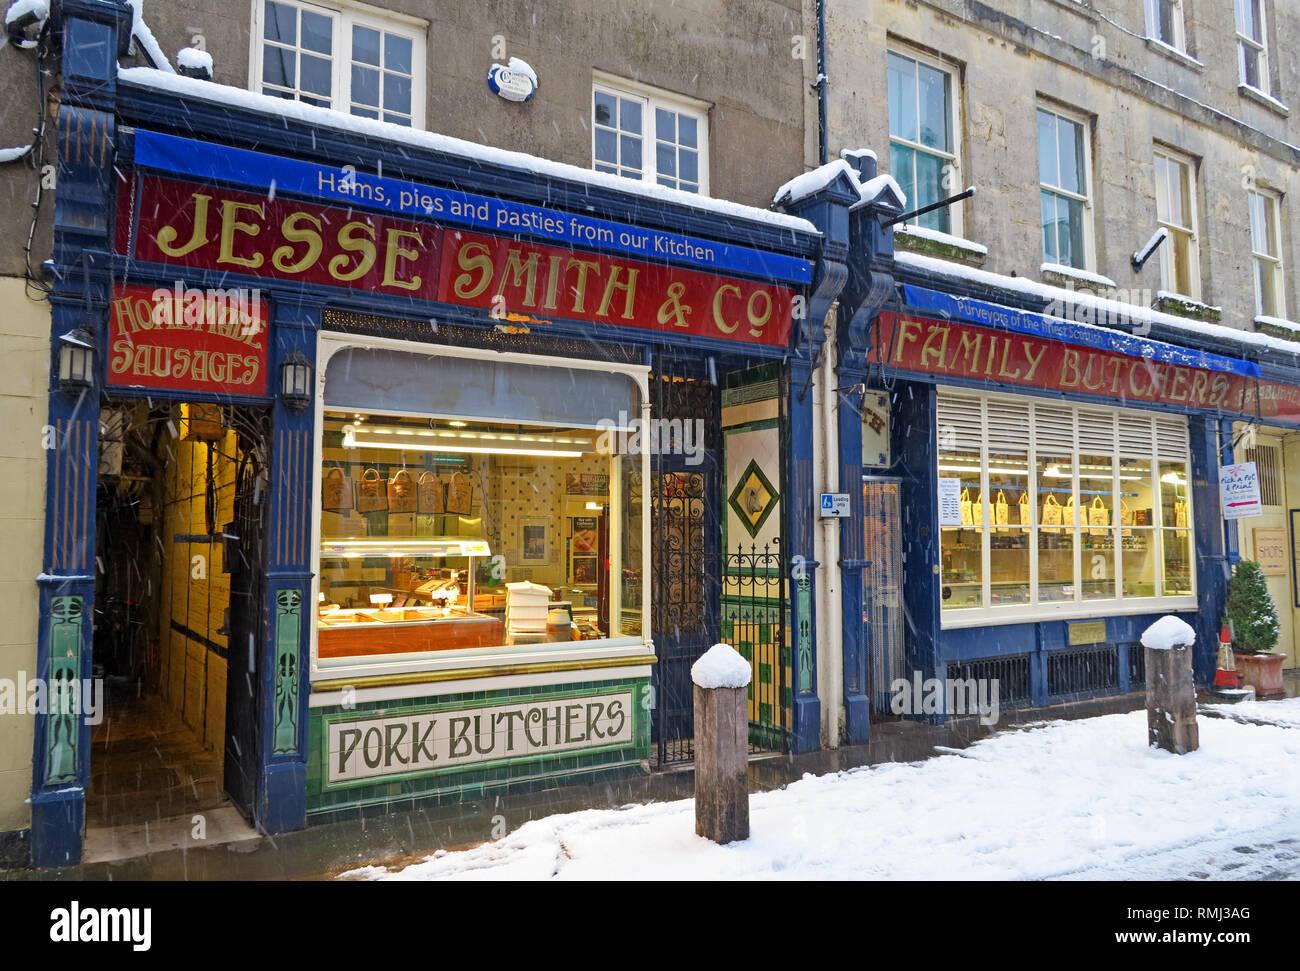 @HotpixUK,HotpixUK,GoTonySmith,England,UK,snow,cold weather,winter,weather,Christmas,card,scene,cold,colder,tourist,tourism,travel,Oxfordshire,market,town,centre,in winter,Roman,stone,buildings,architecture,Cotswold Architecture,Cotswolds,Cotswold,pork,butchers,Jesse Smith,traditional,pork butchers,pork butcher,South West England,Black Jack St,Black Jack Street